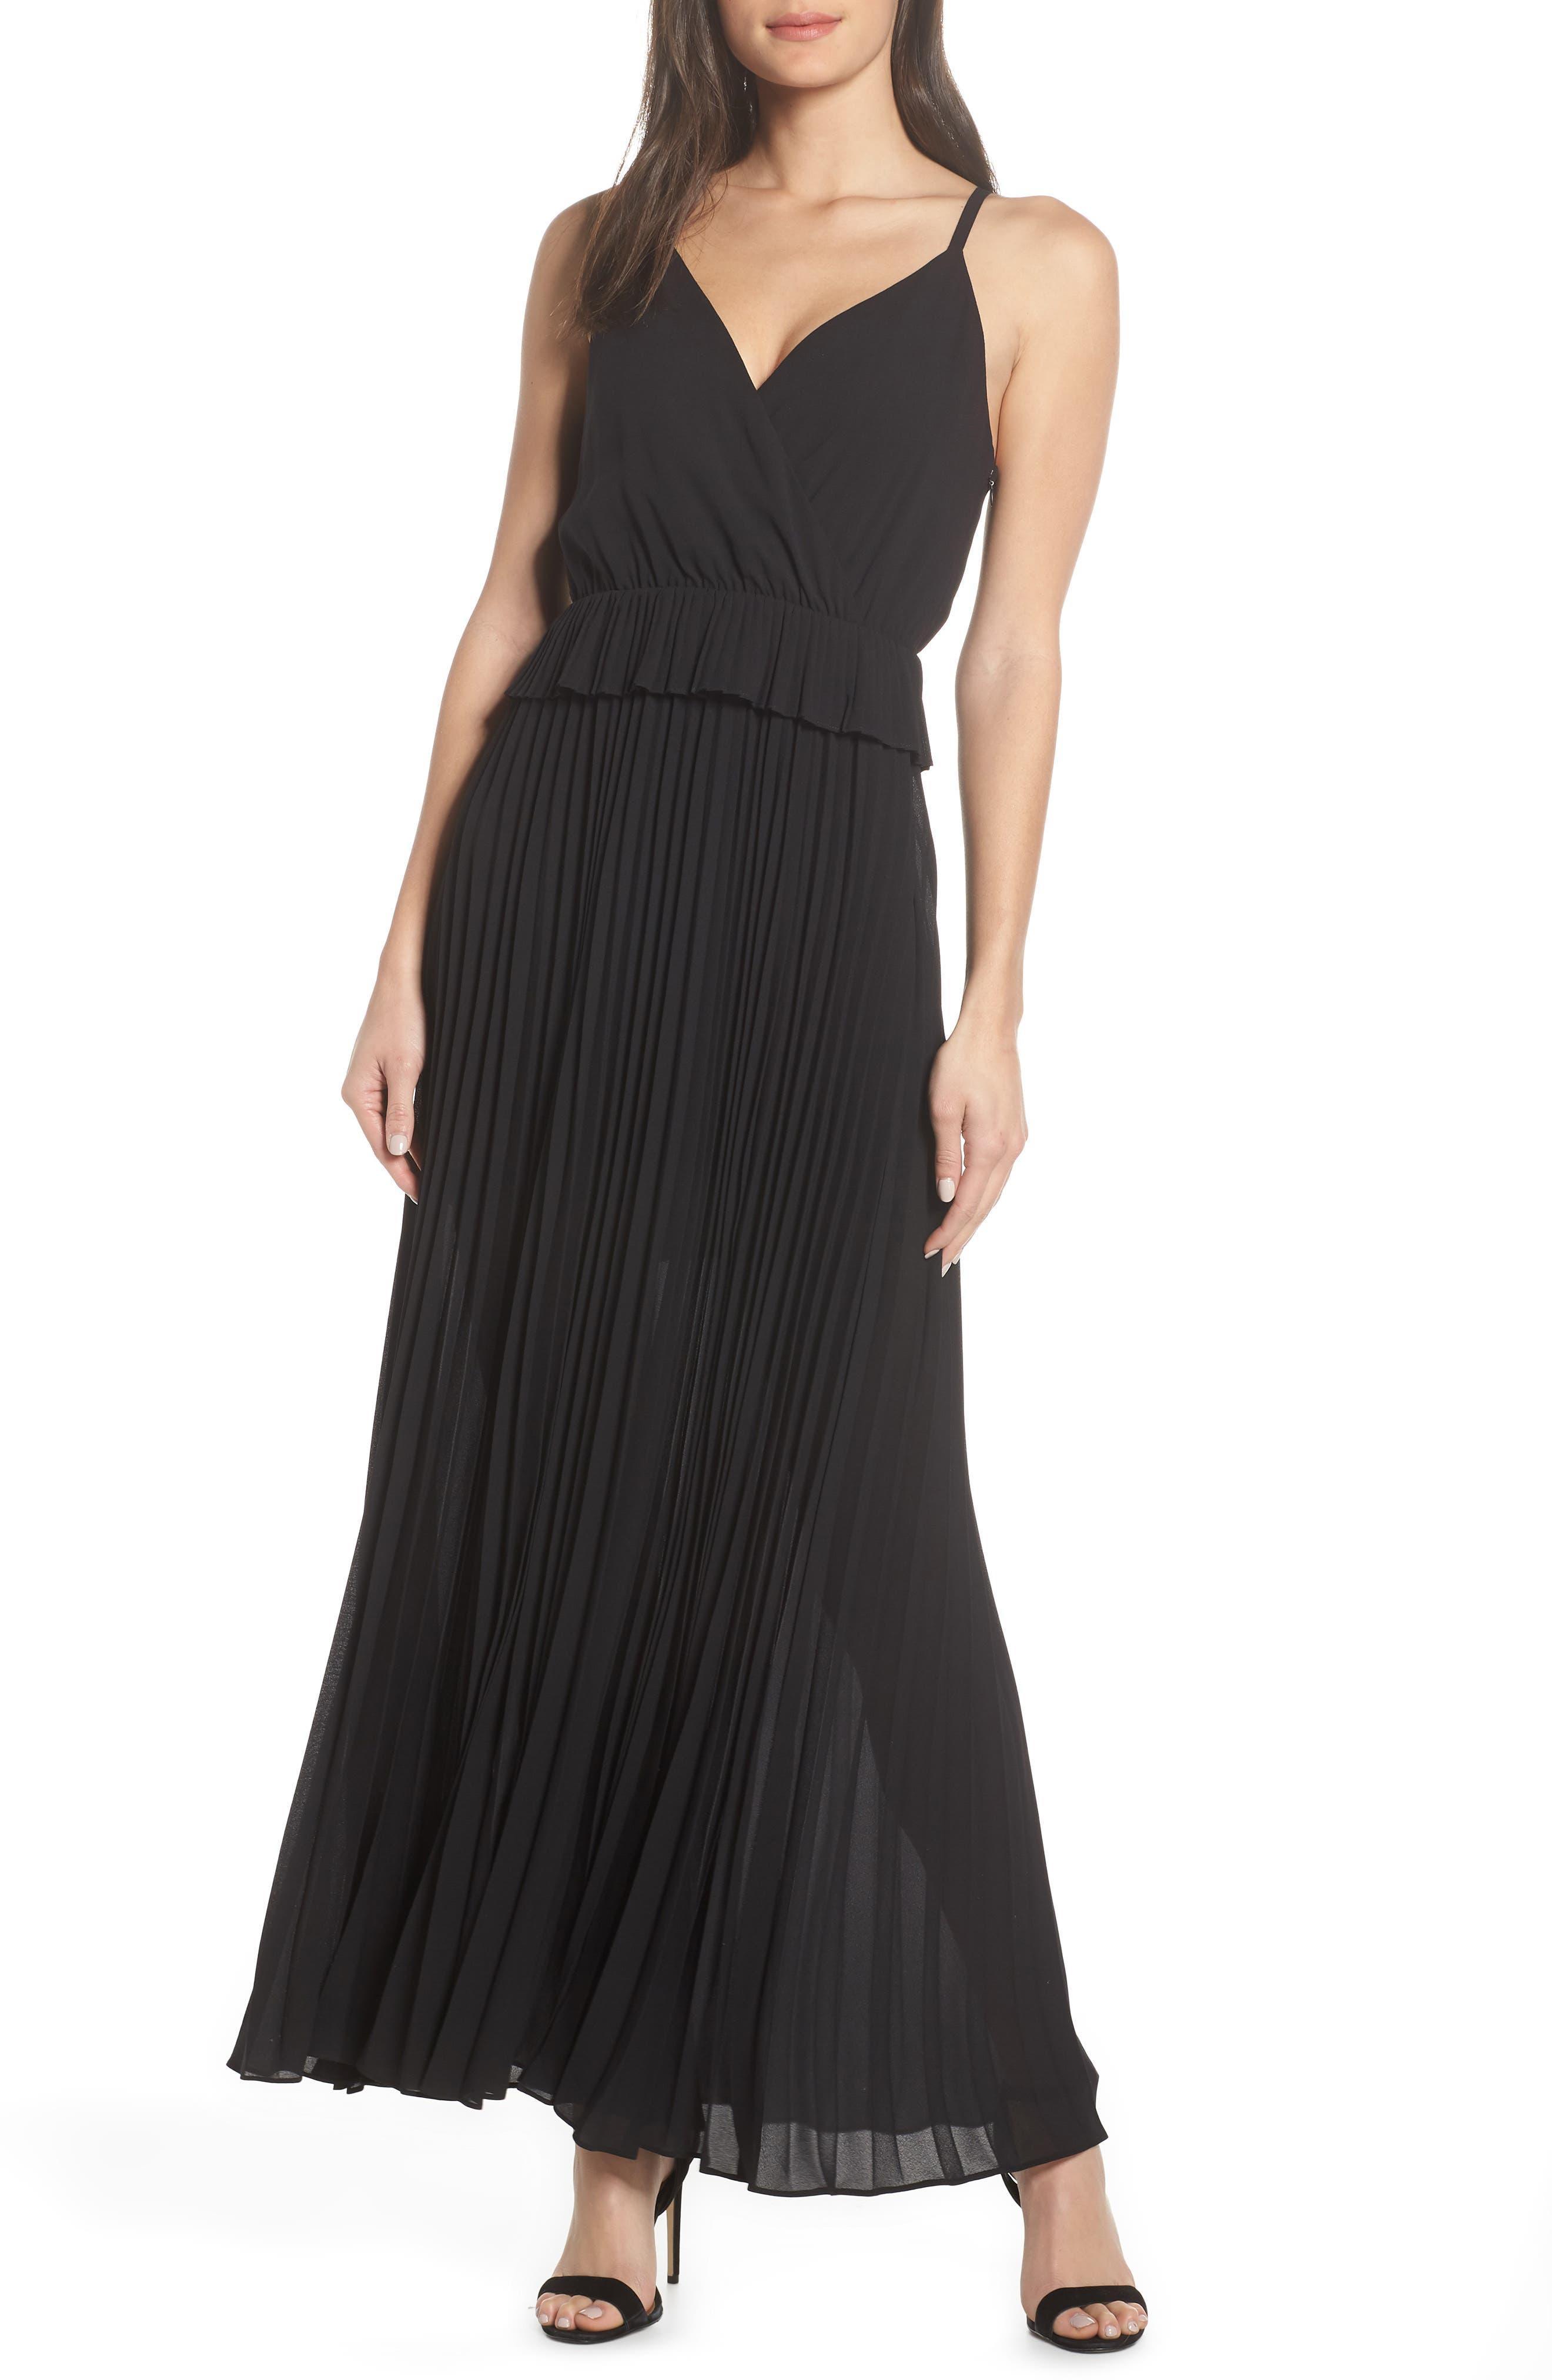 Ali & Jay Olivet Pleated Maxi Dress, Black